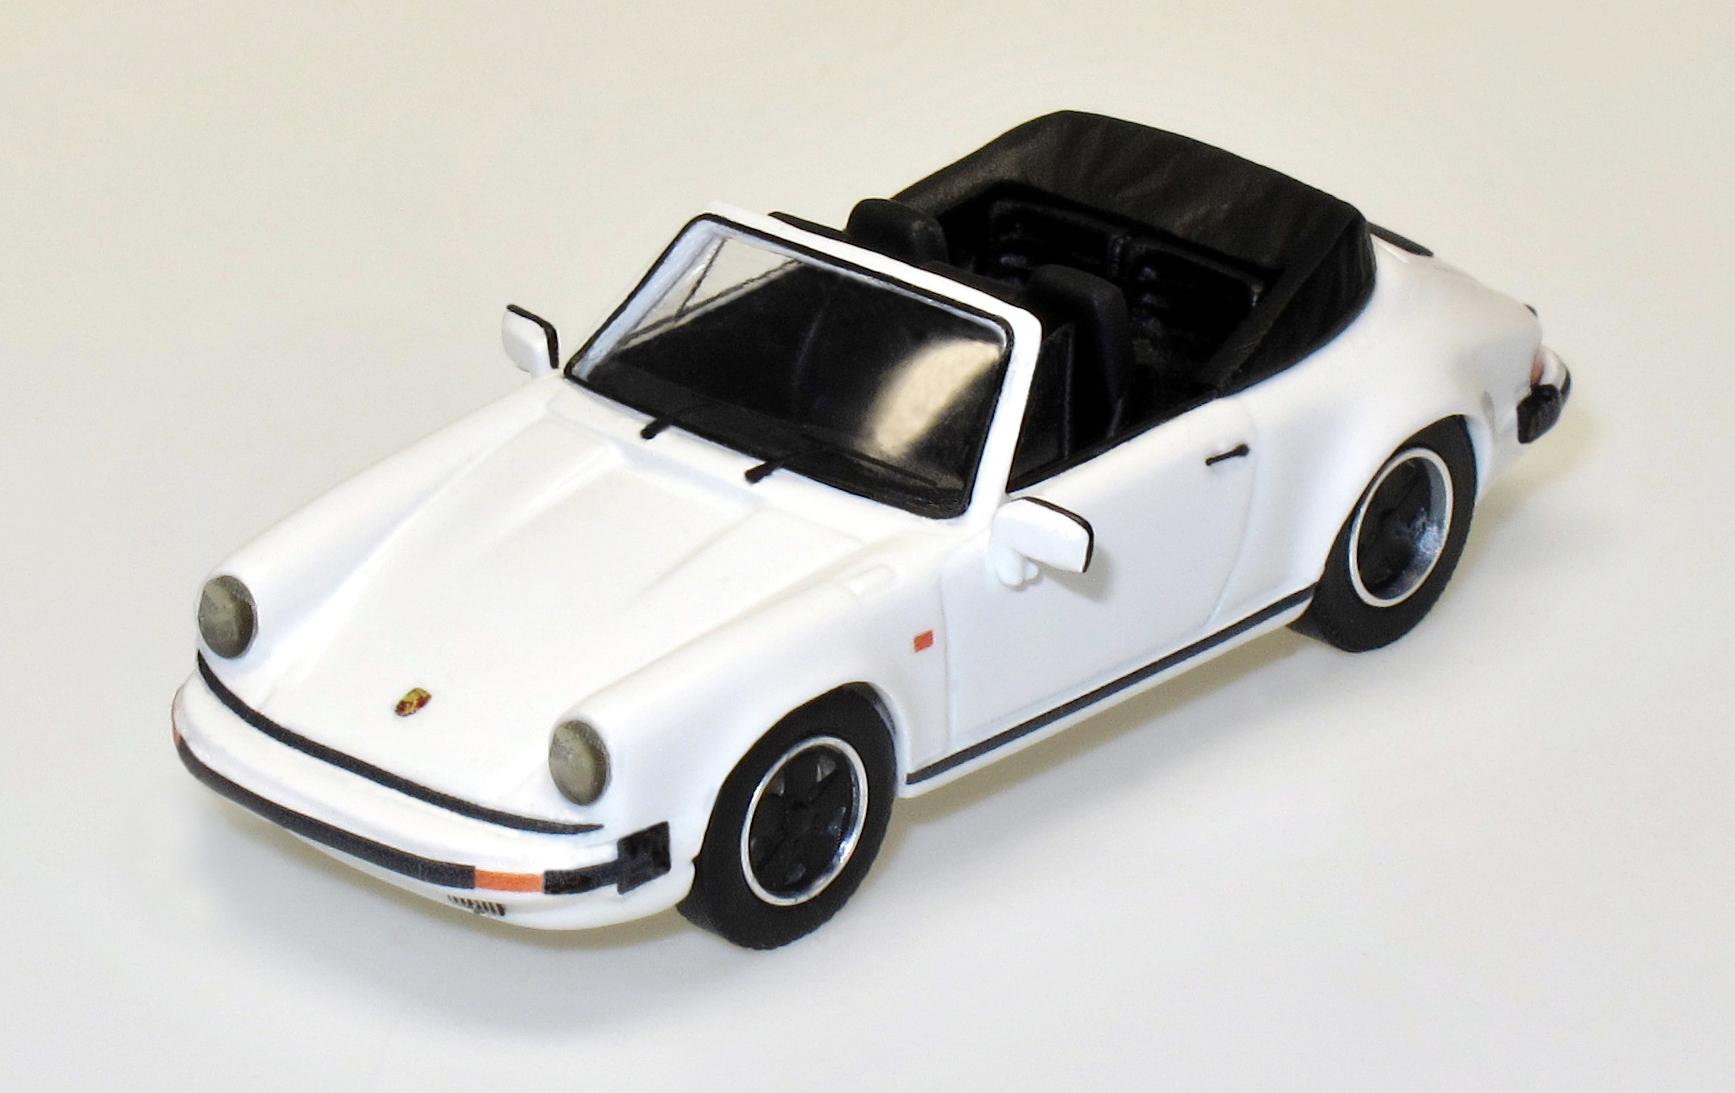 87084 porsche 911 sc carrera cabrio hightech modelle. Black Bedroom Furniture Sets. Home Design Ideas